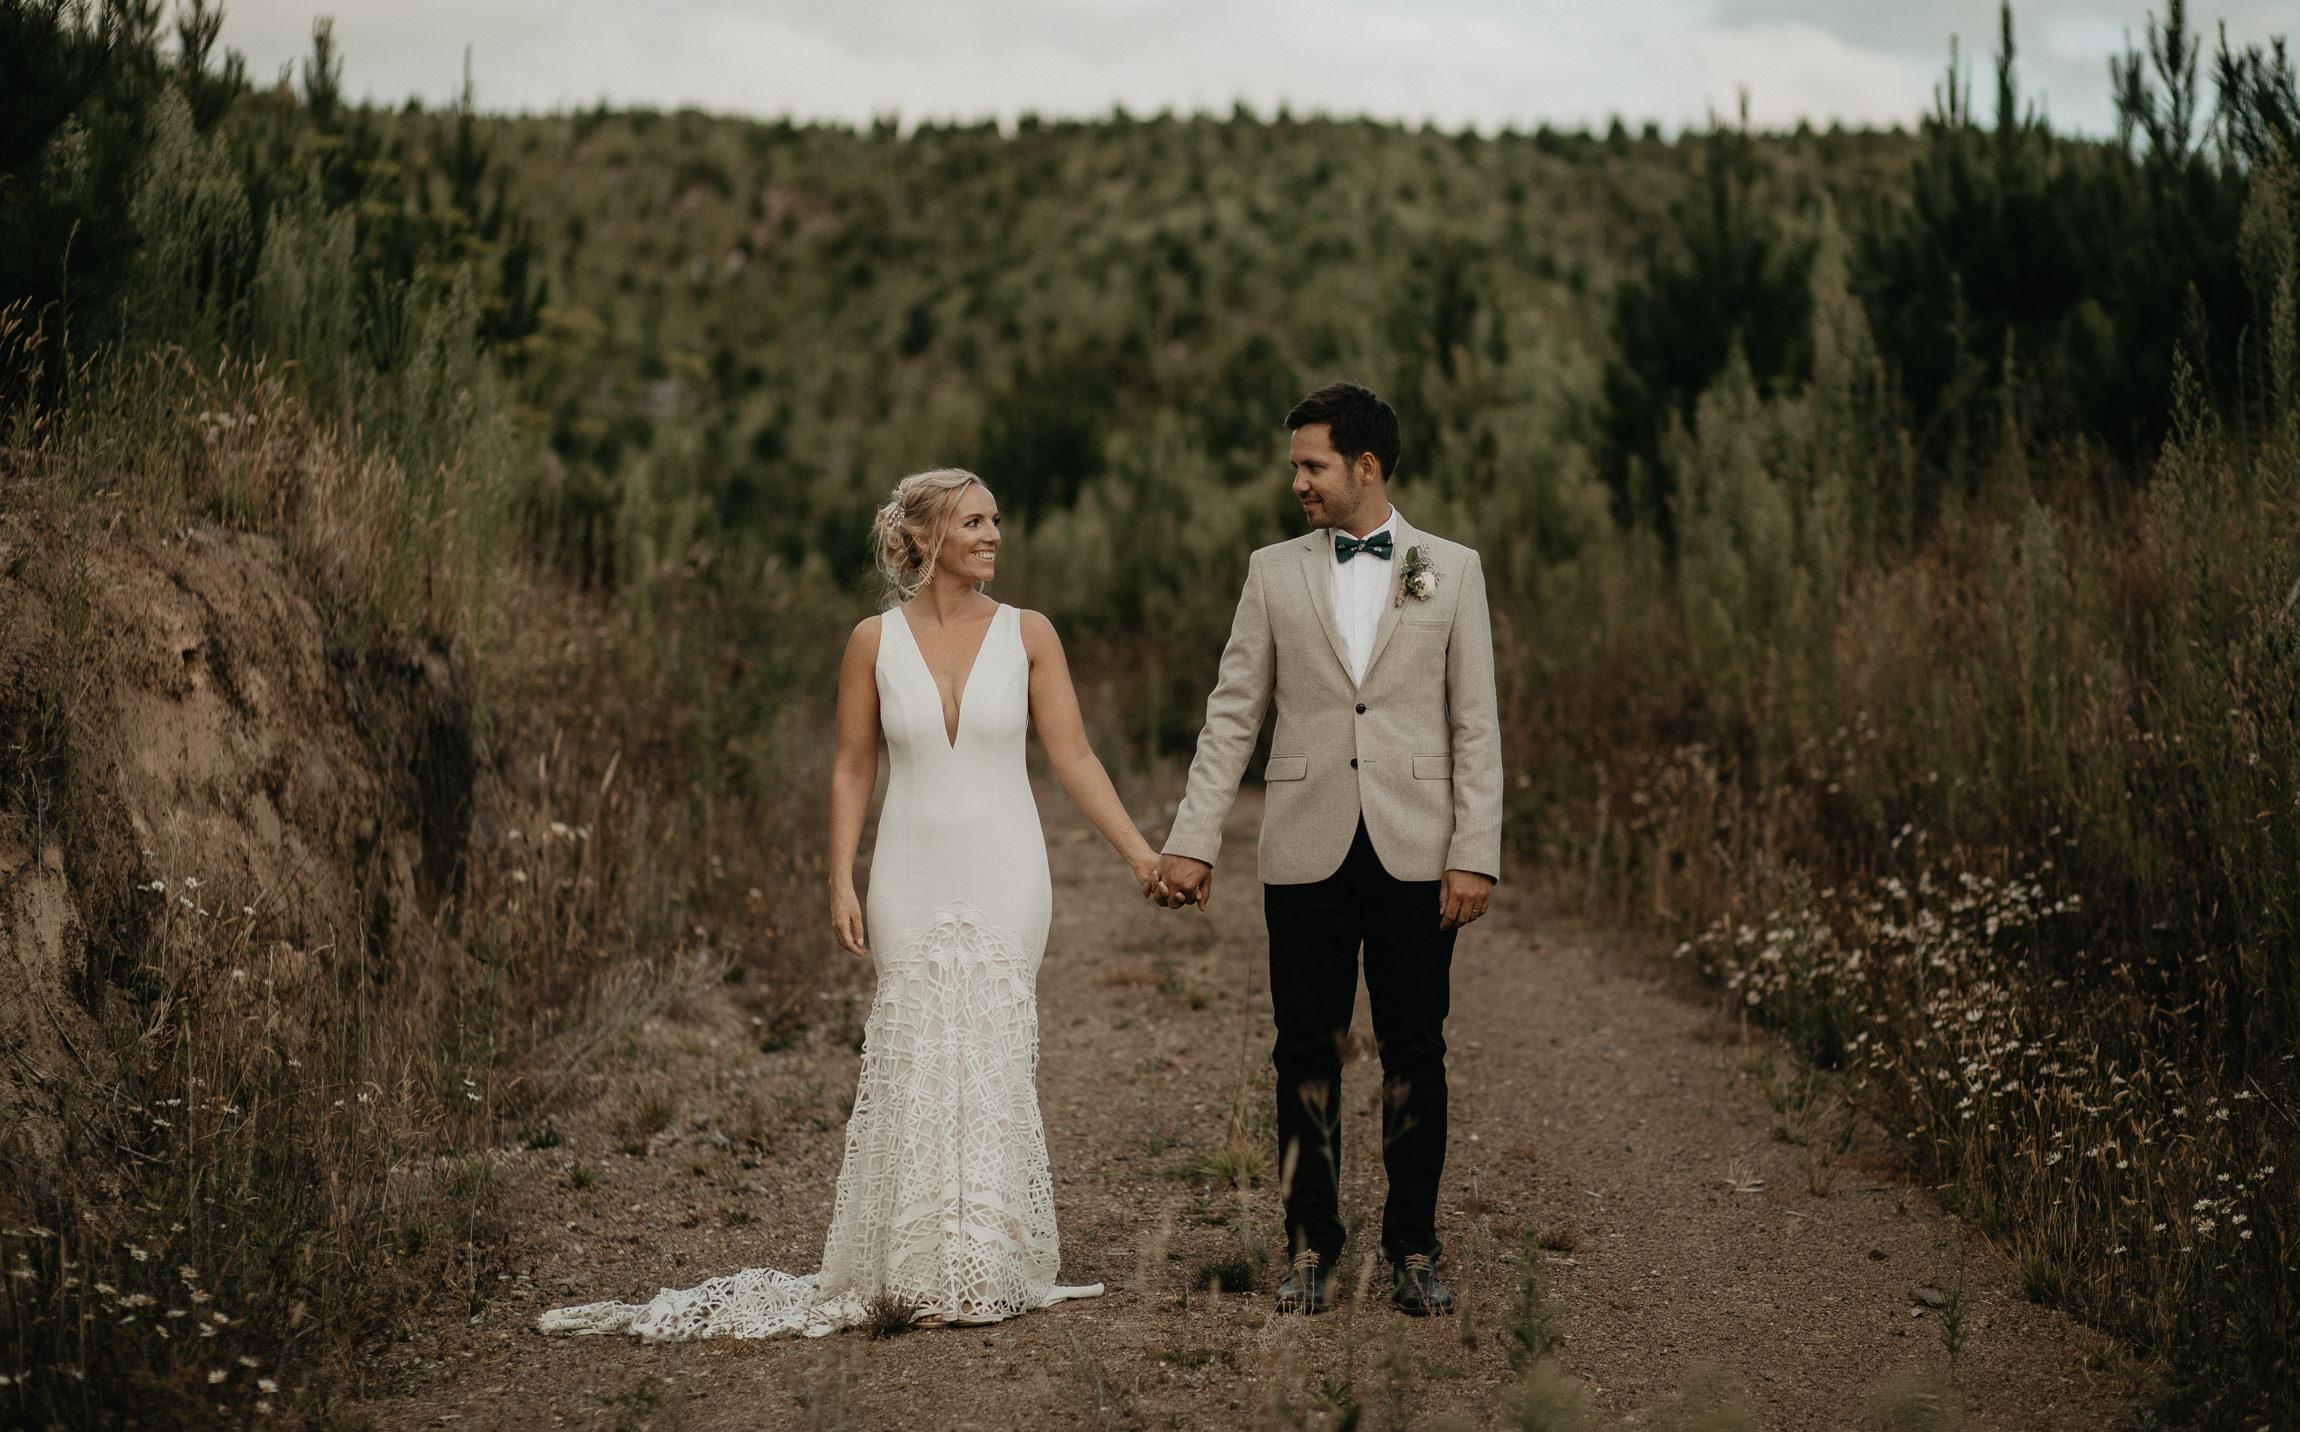 oldforestschool-wedding-blog-172.jpg